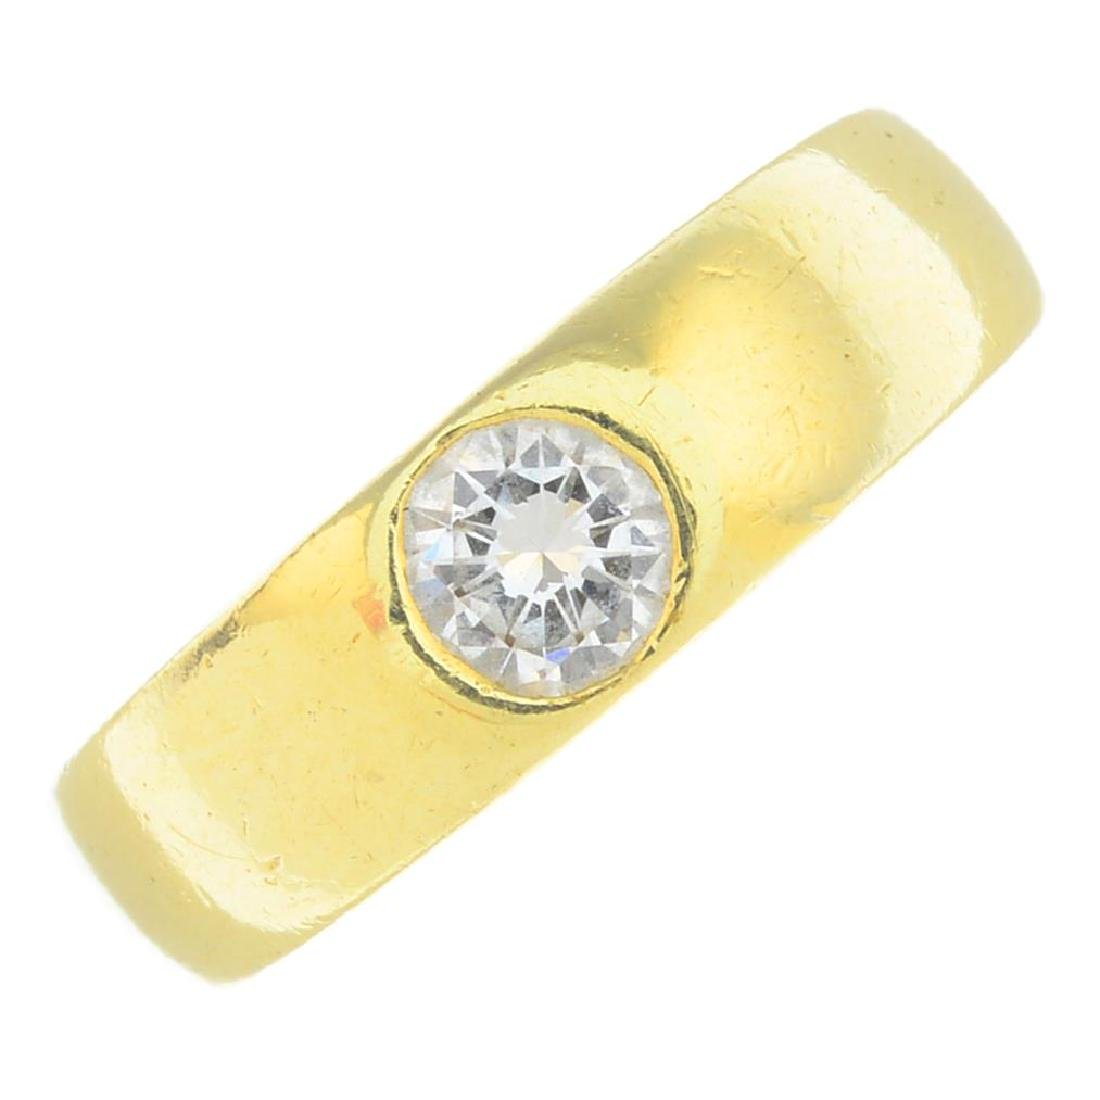 A diamond band ring. The brilliant-cut diamond, inset